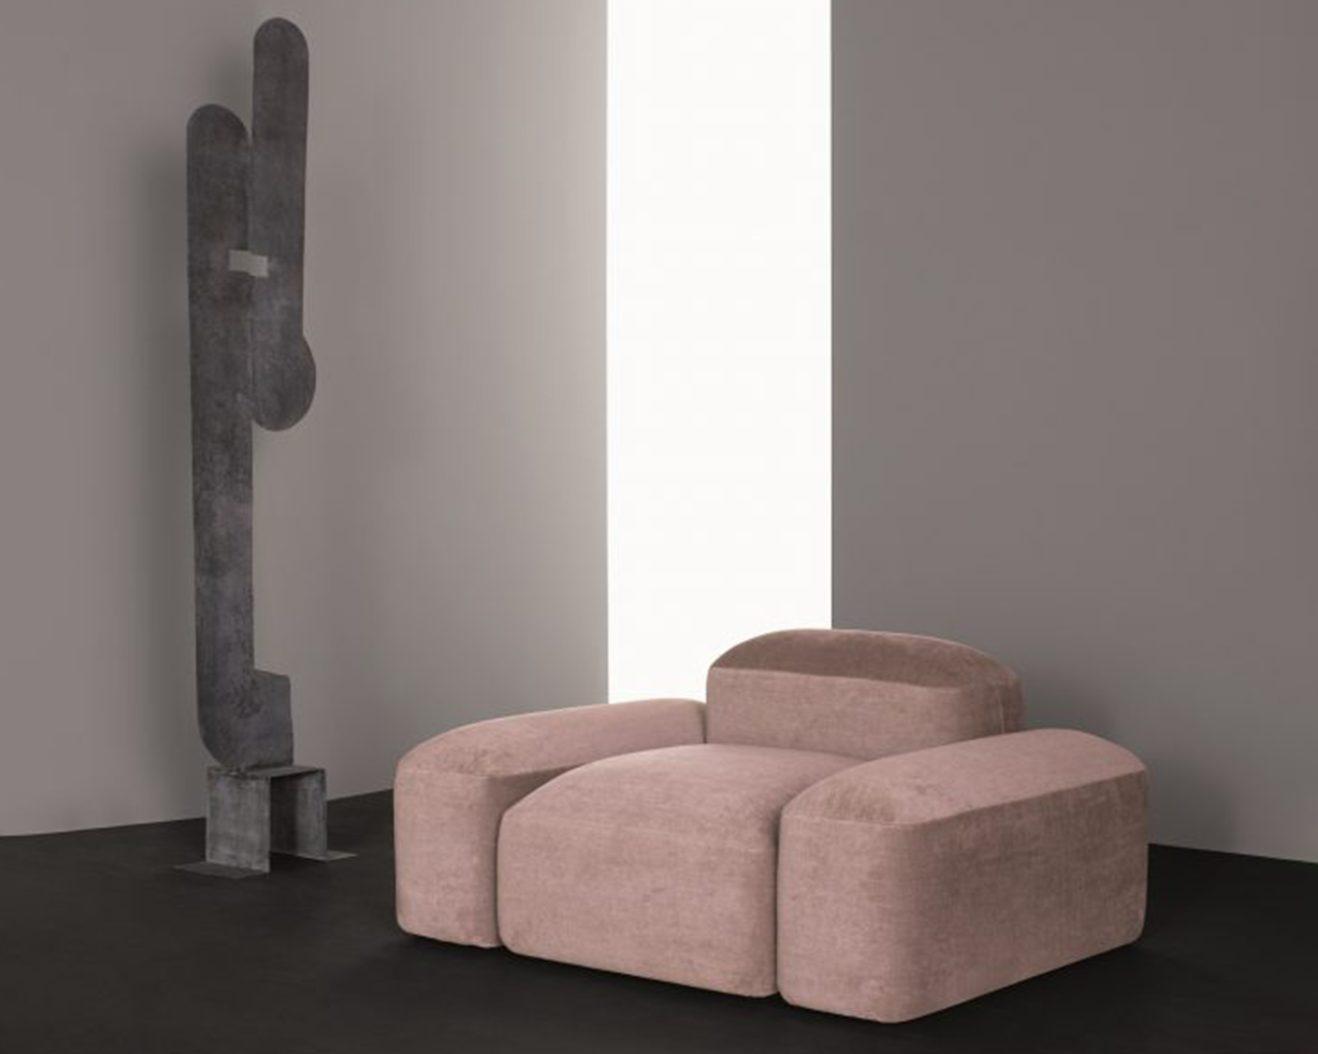 Lapis-armchair-1amuralab-emanuel-gargano-1